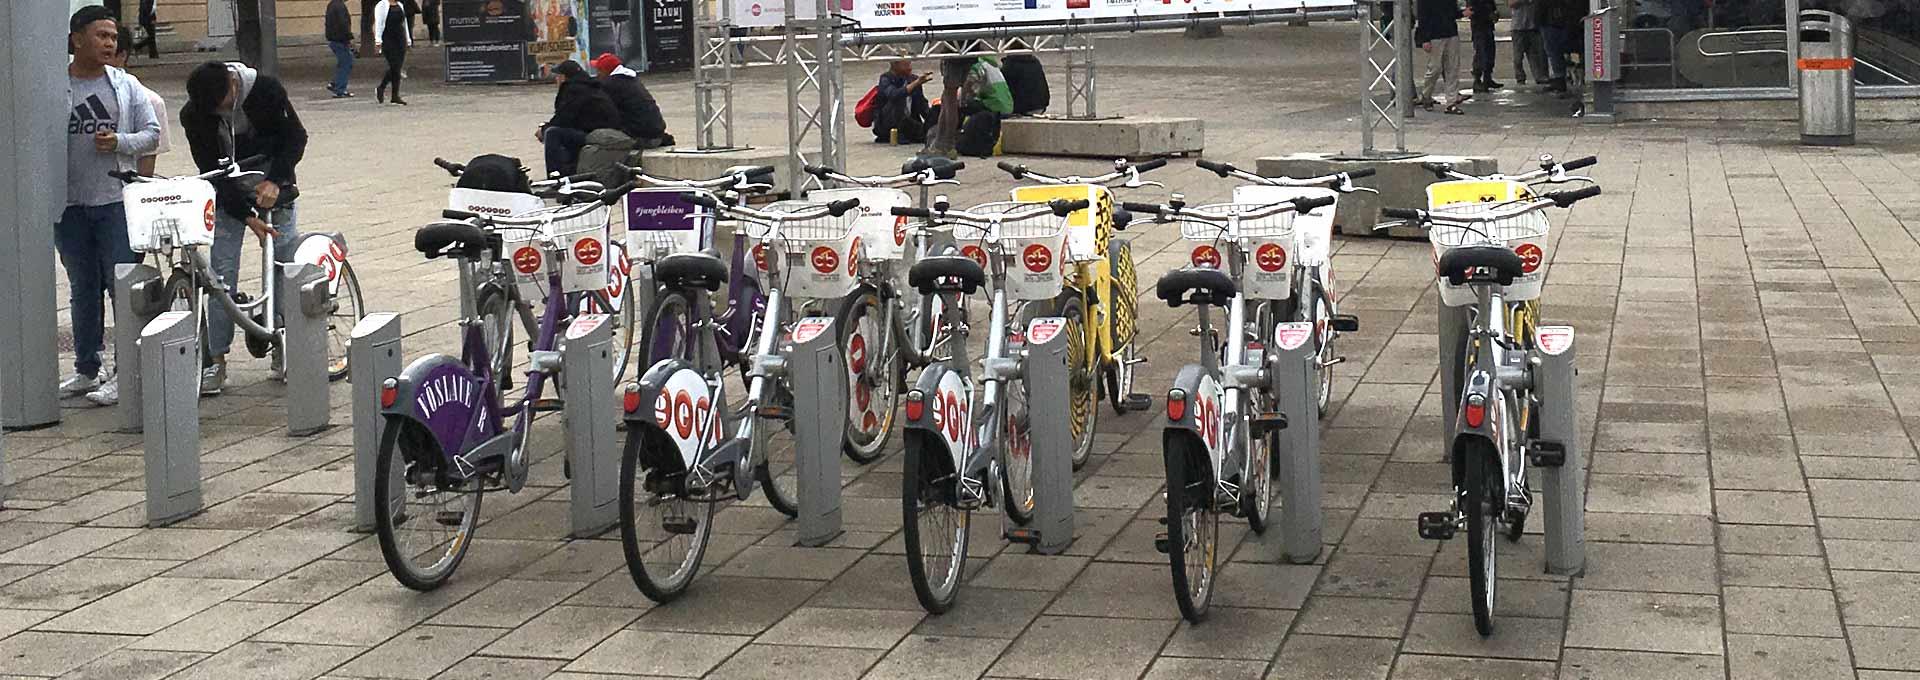 Using the Free City Bike in Vienna Austria